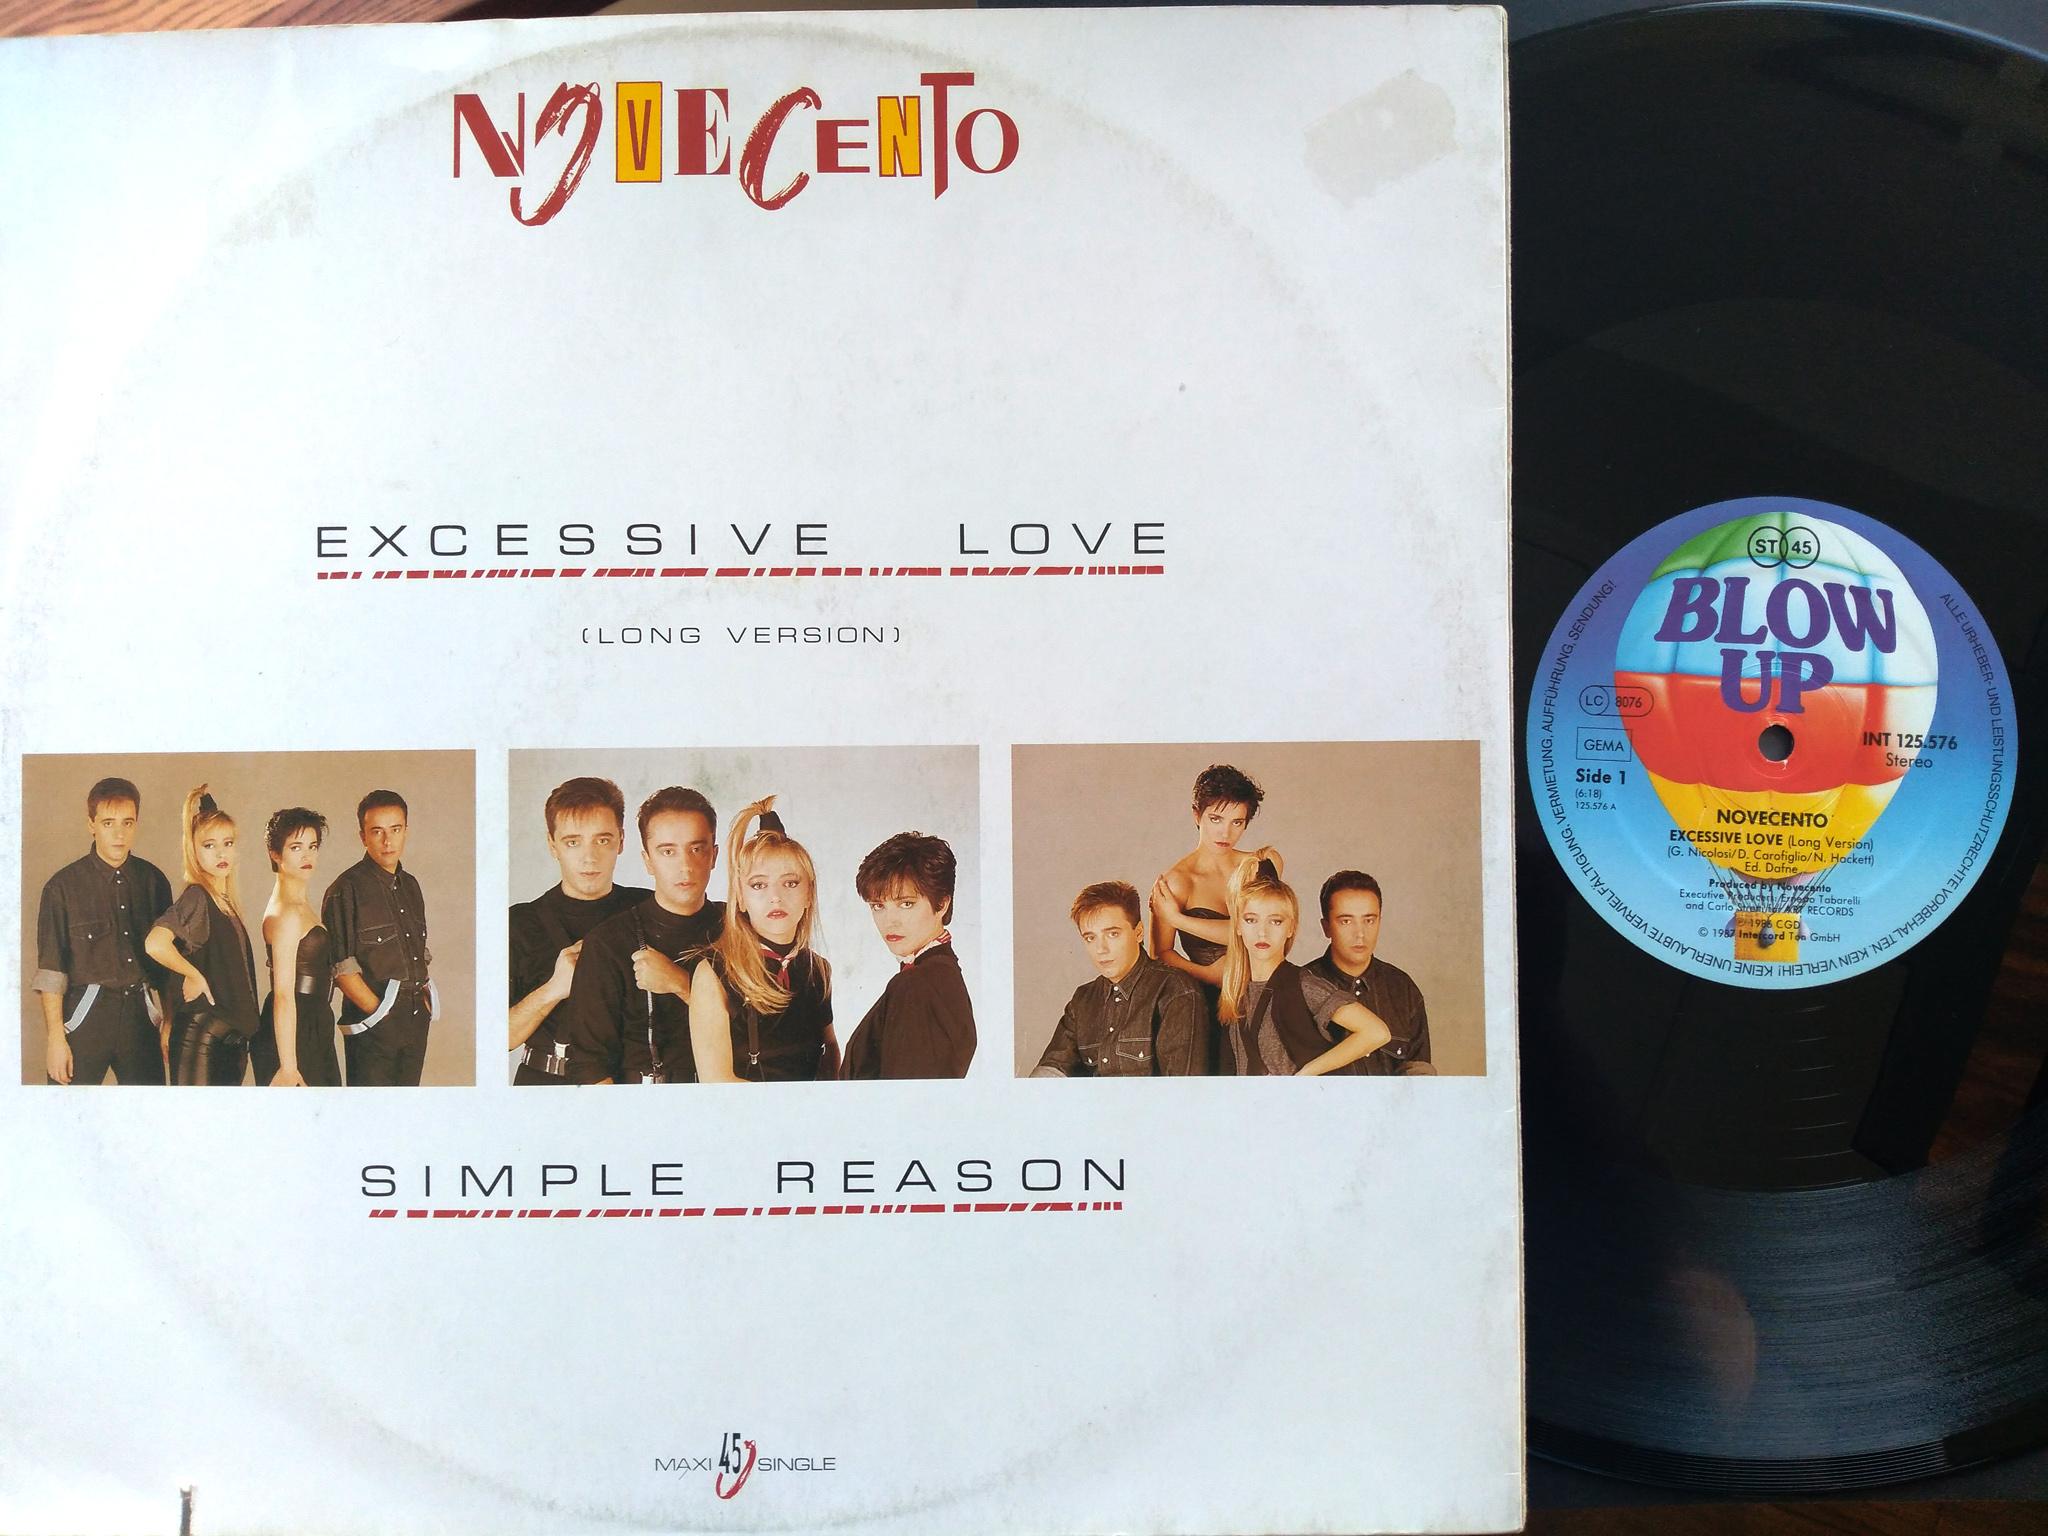 Novecento - Excessive Love